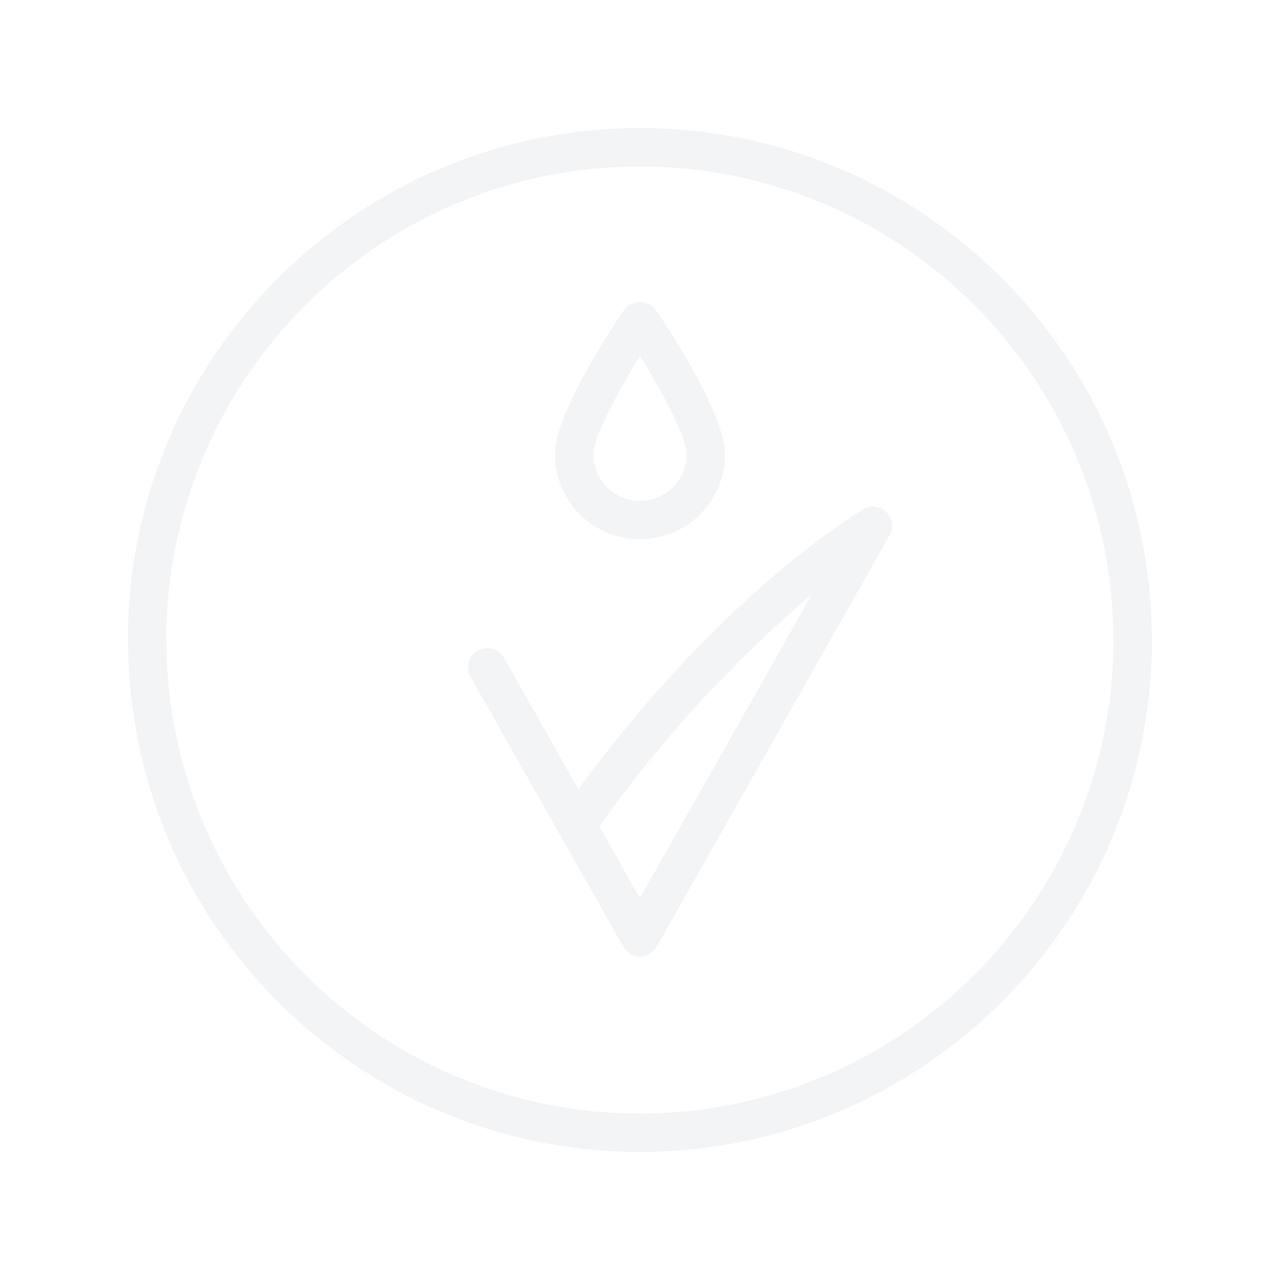 GOSH Boombastic XXL Volume Mascara 13ml